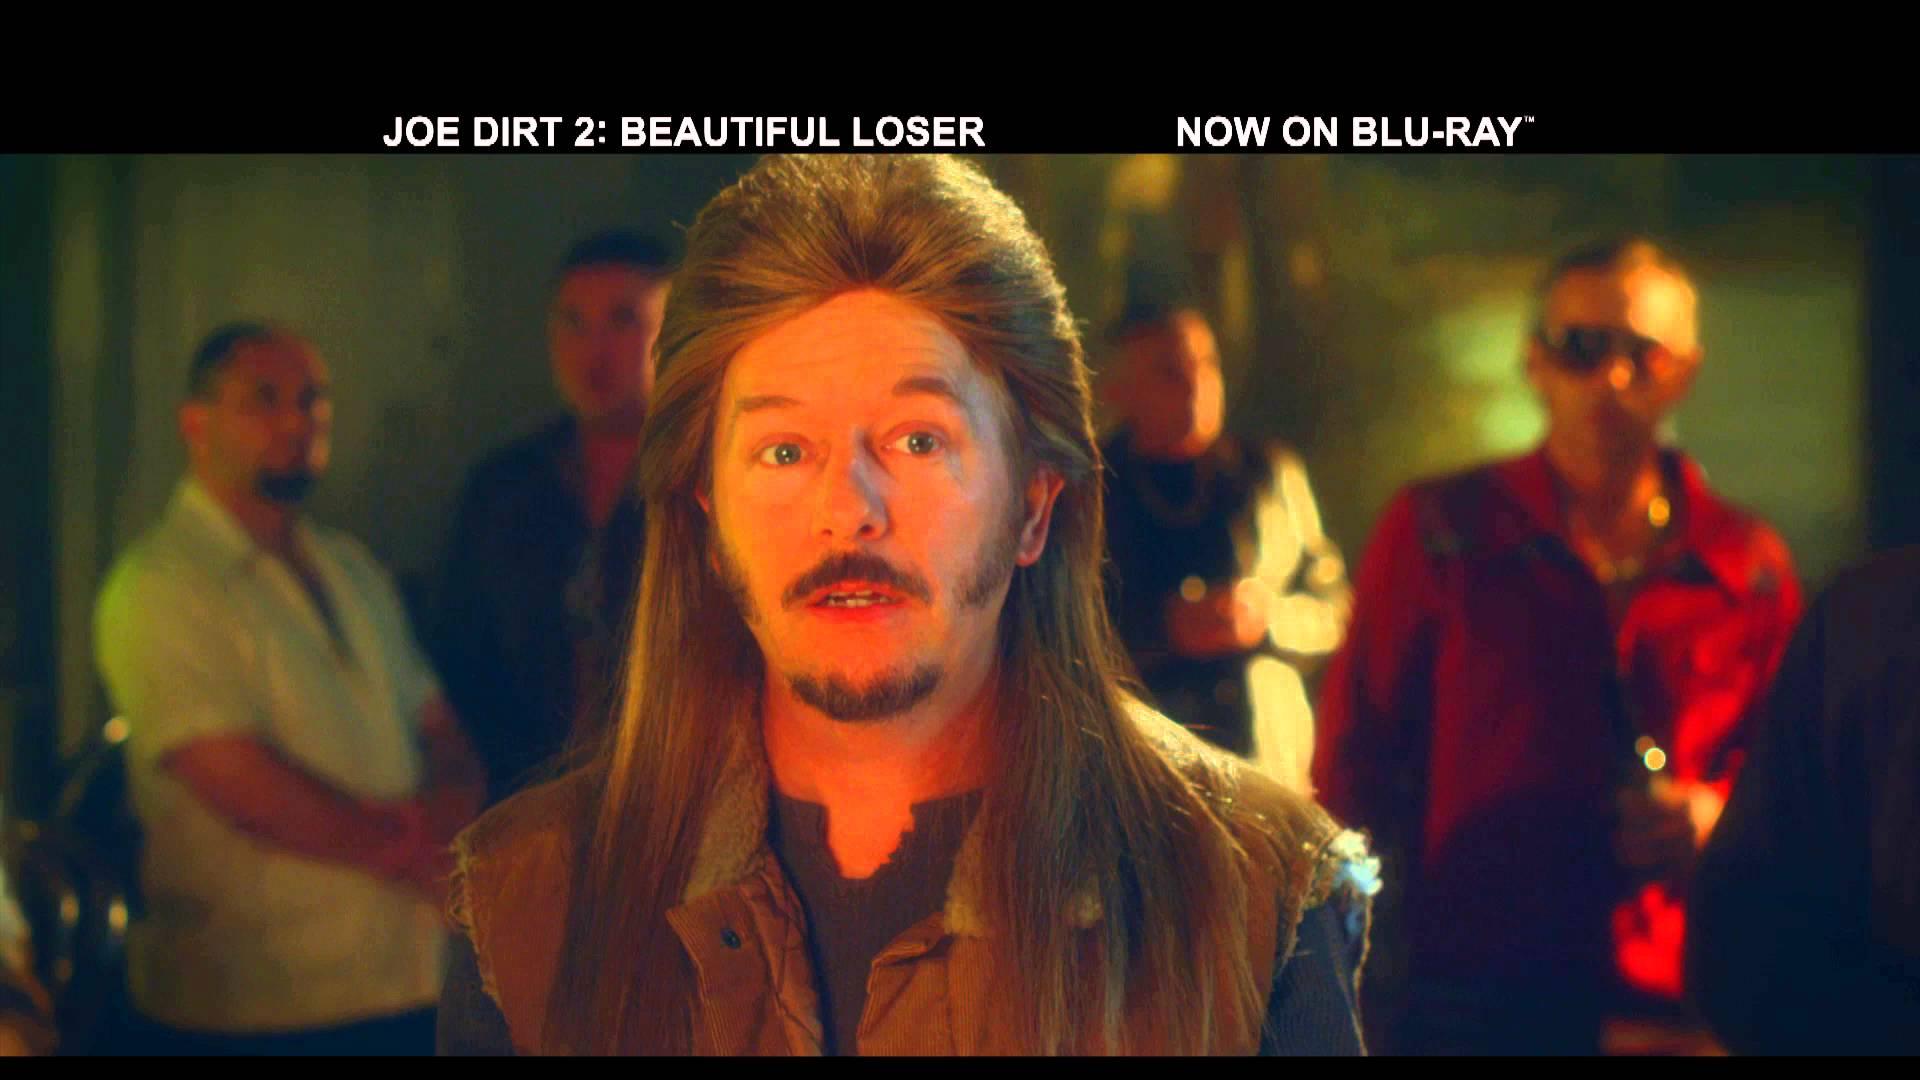 Joe Dirt 2: Beautiful Loser – Now on Blu-ray!